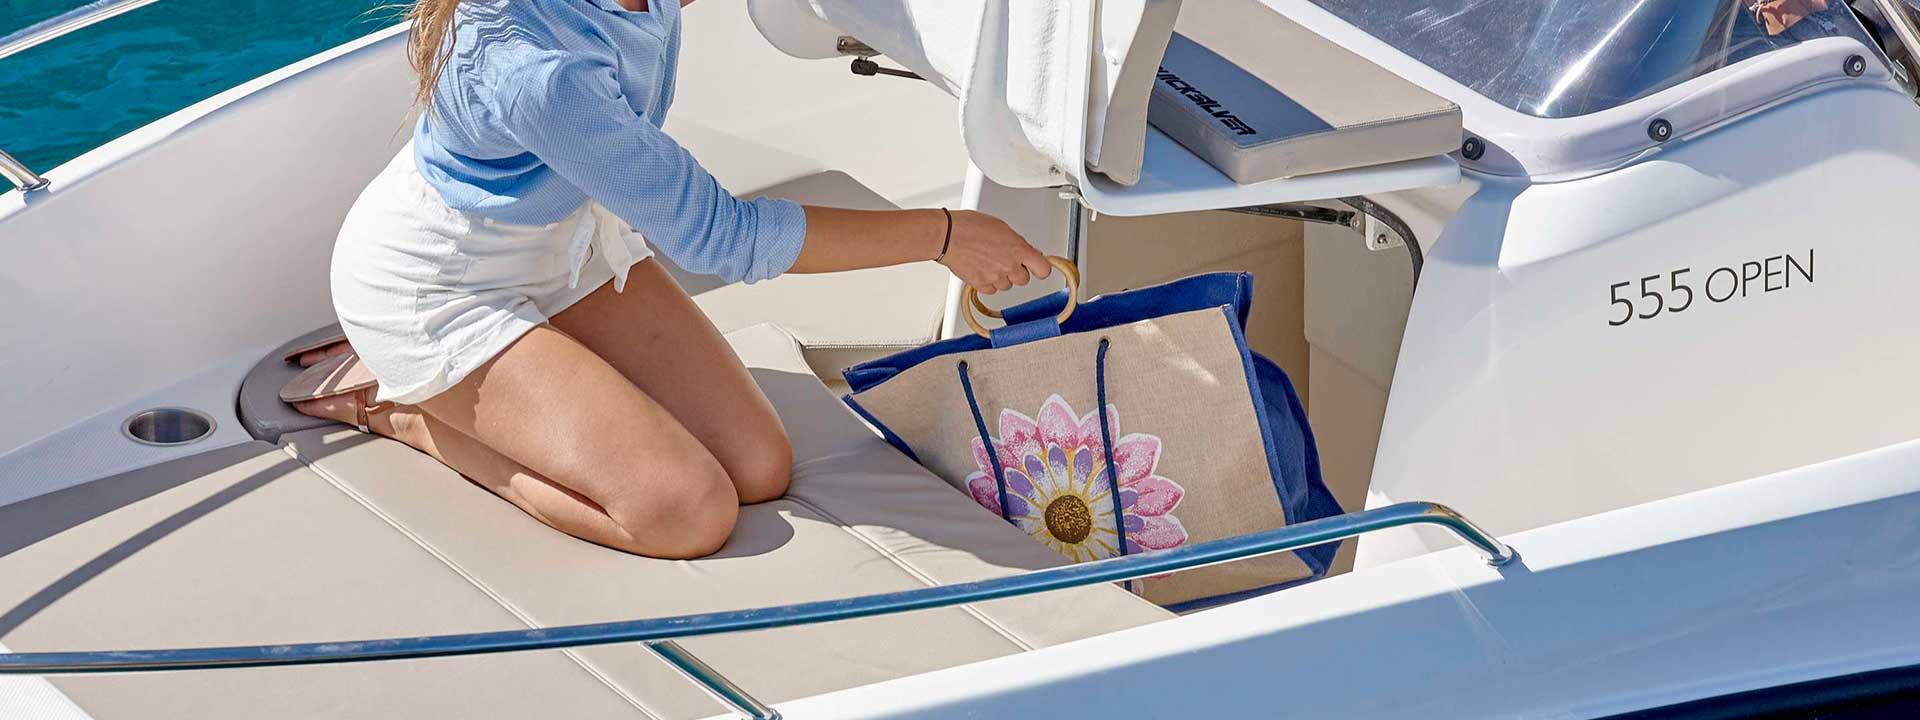 mayer-charter-boat-header-quicksilver-activ-555-open-05